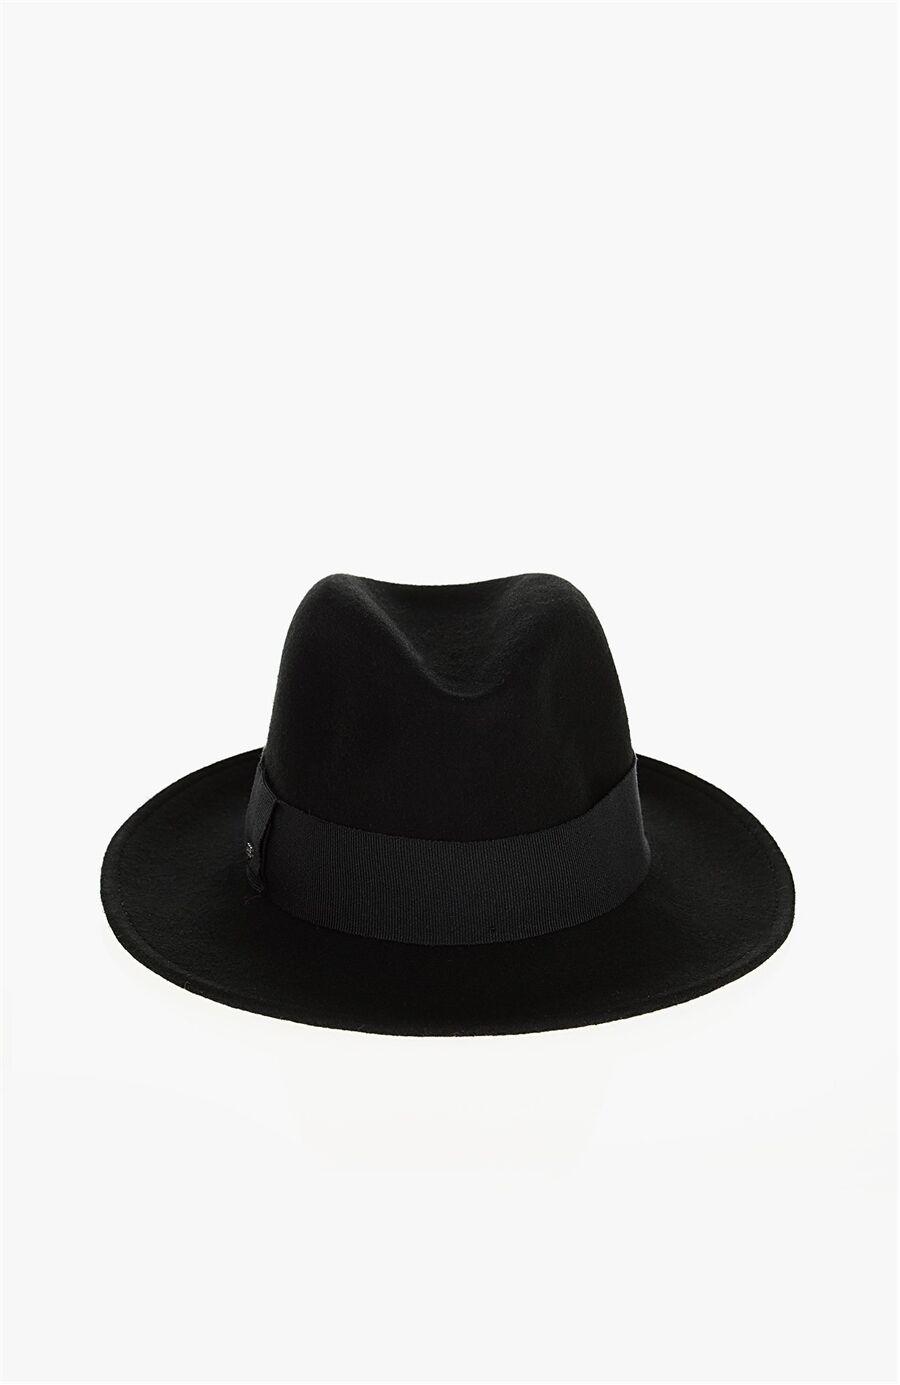 Yün Siyah Kadın Şapka